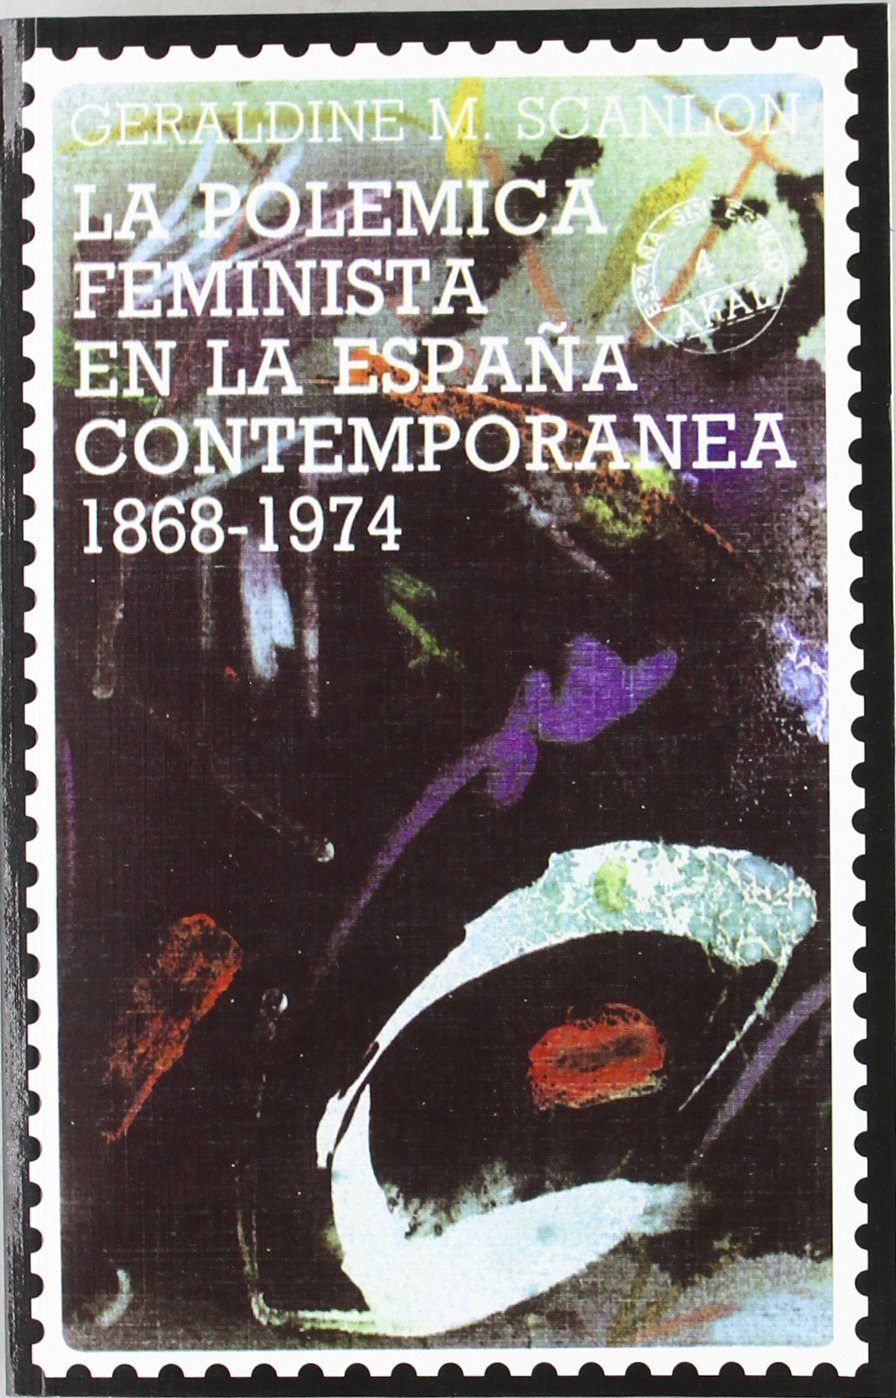 La polémica feminista en la España contemporánea, 1868-1974 España ...